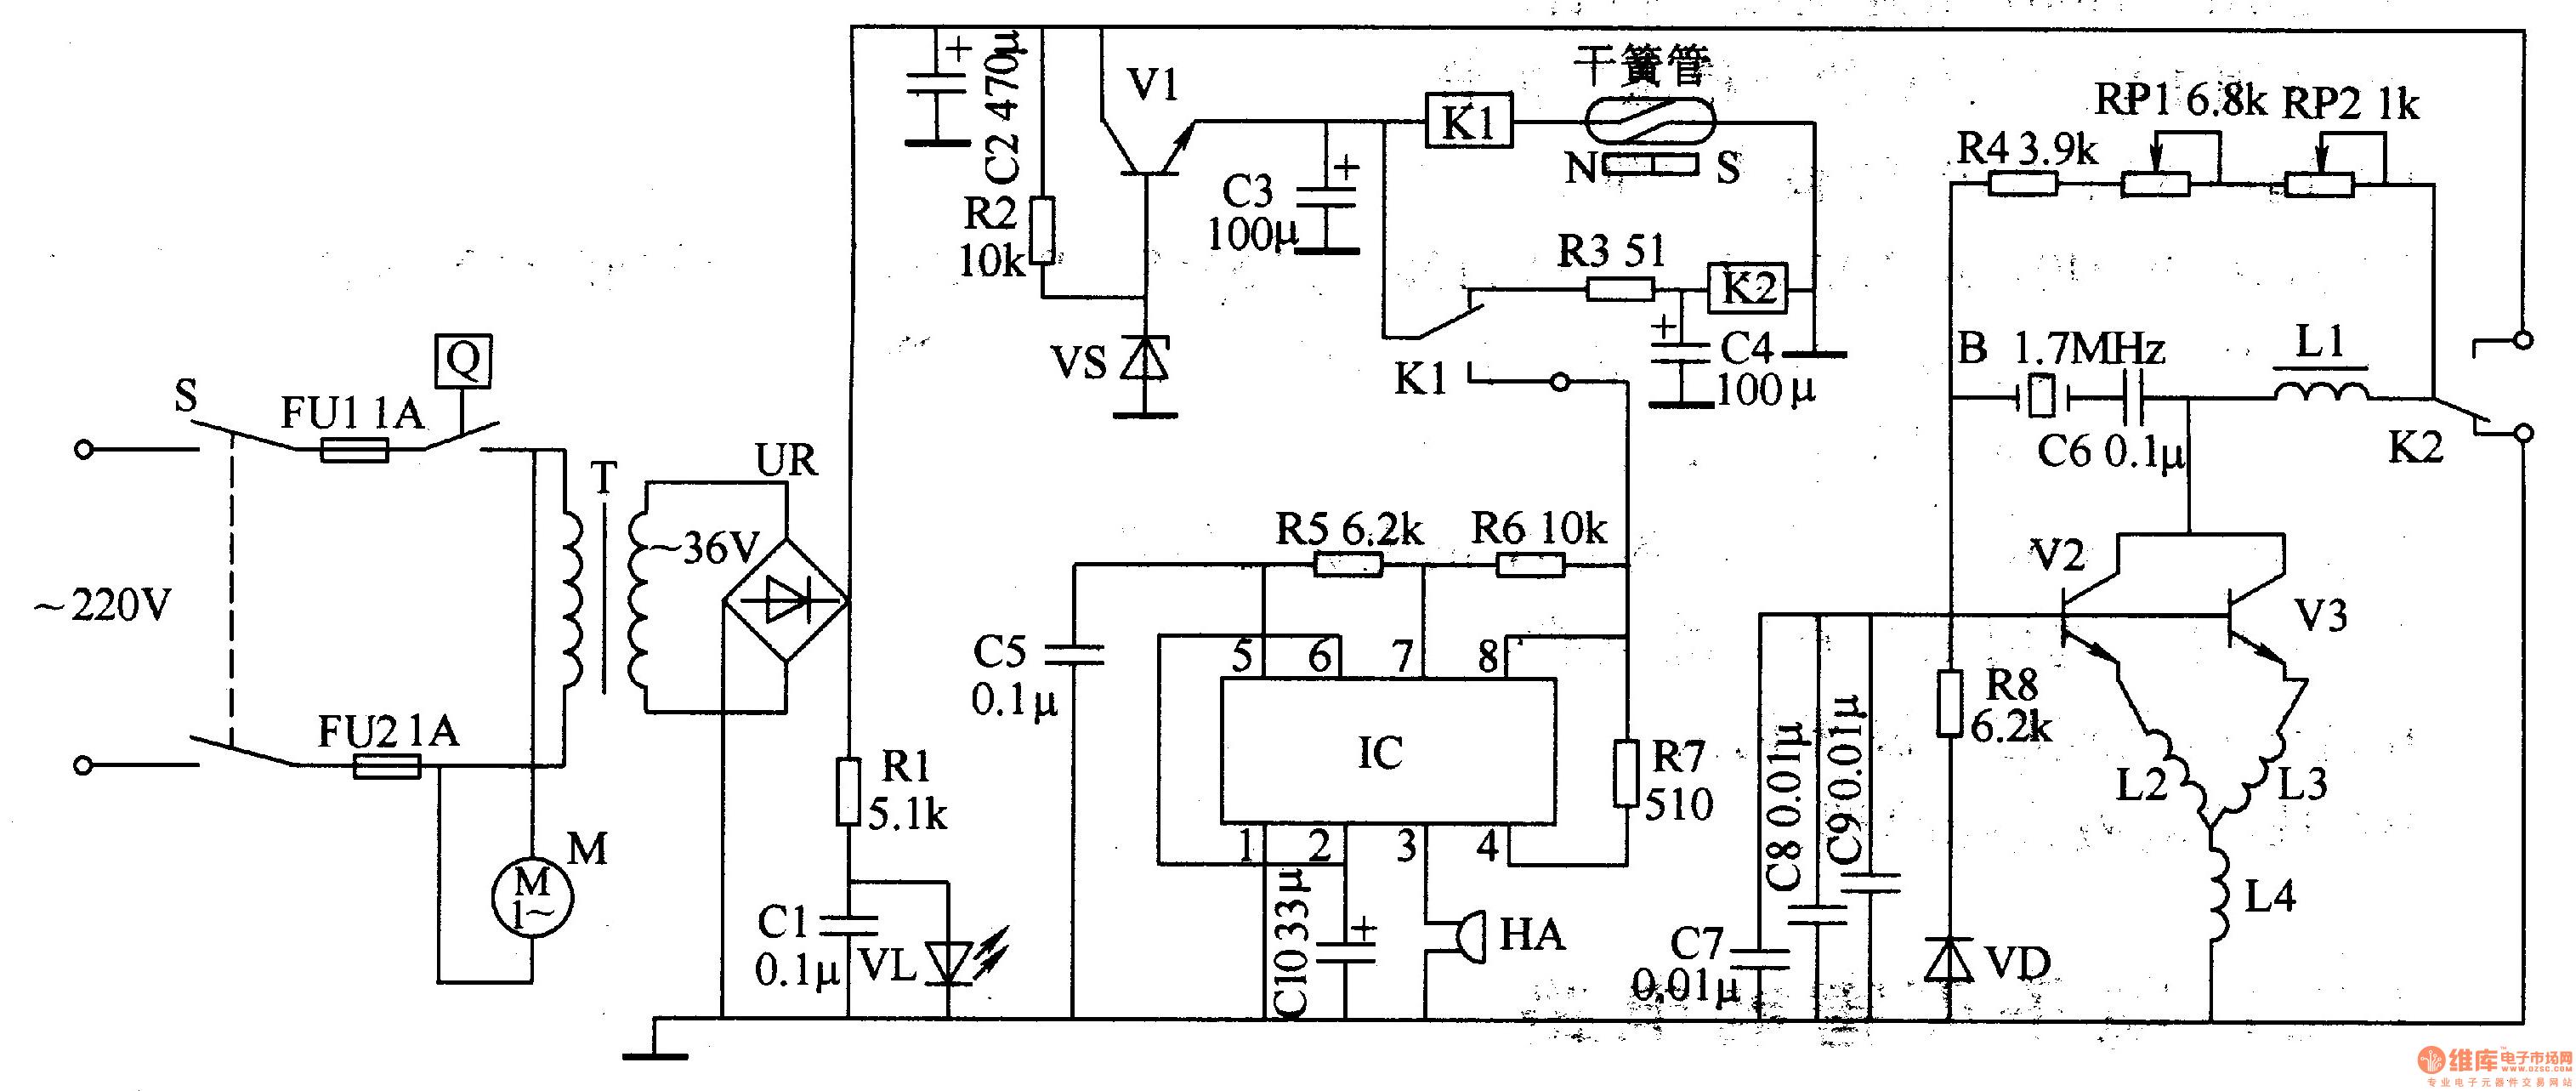 Snap Ultrasonic Circuit Page 3 Audio Circuits Nextgr Photos On 2